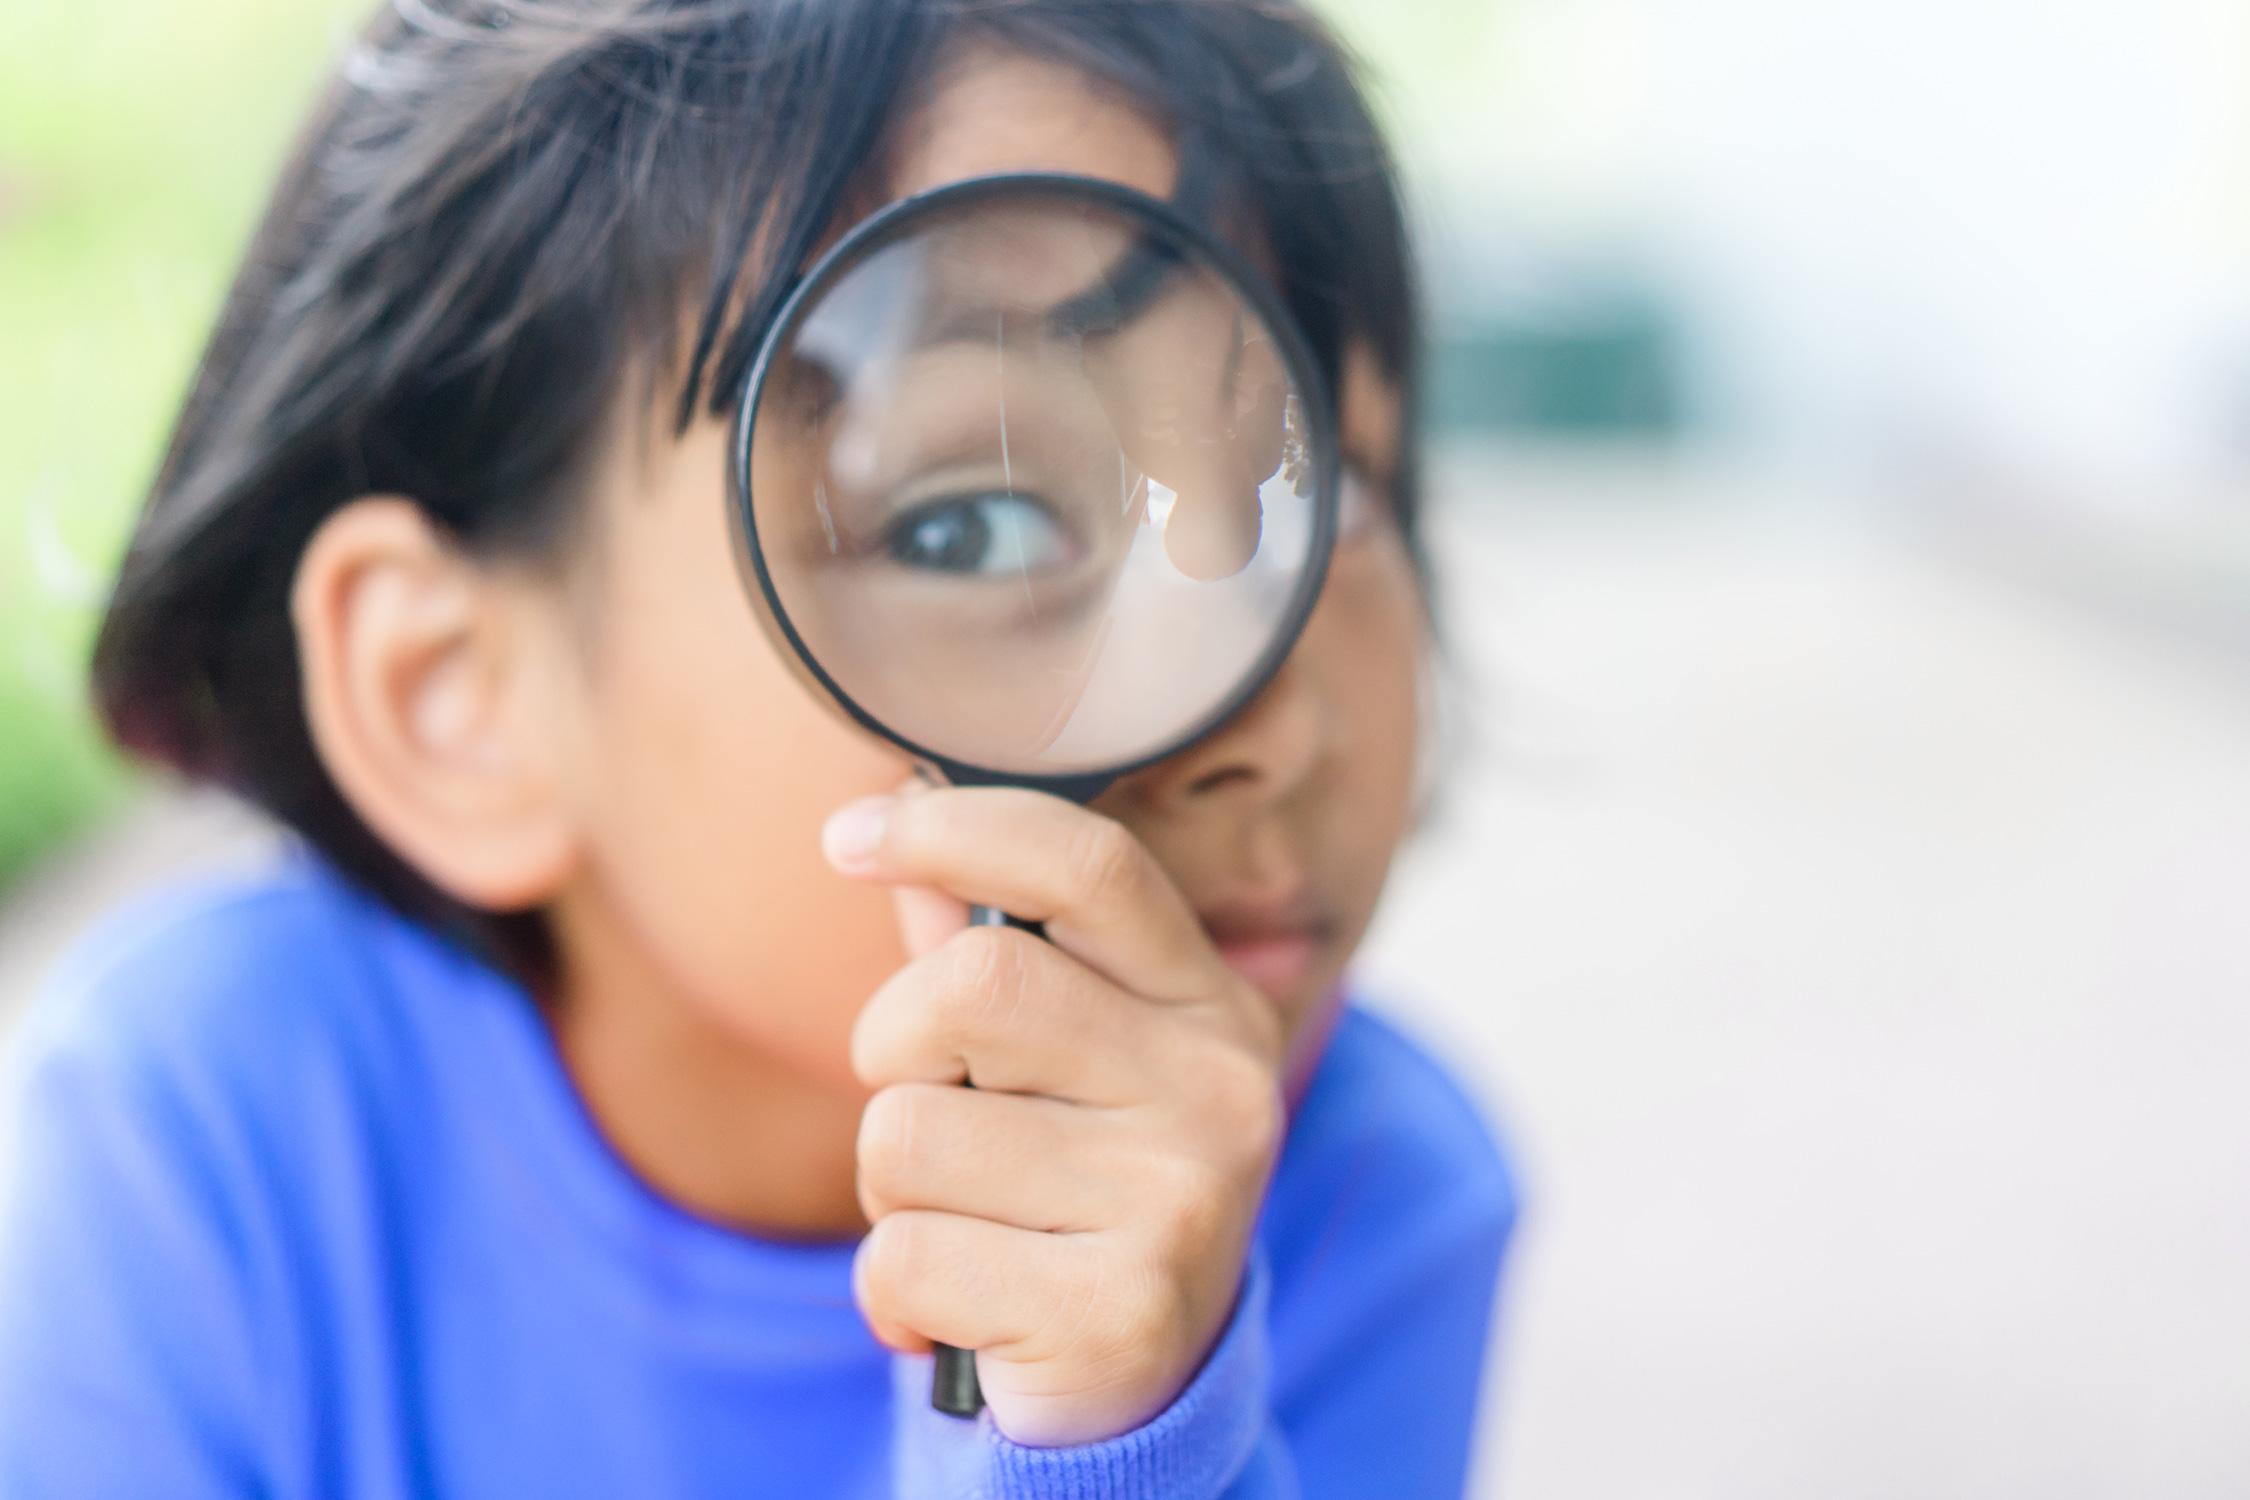 eye doctor consultation kids pediactric eye care